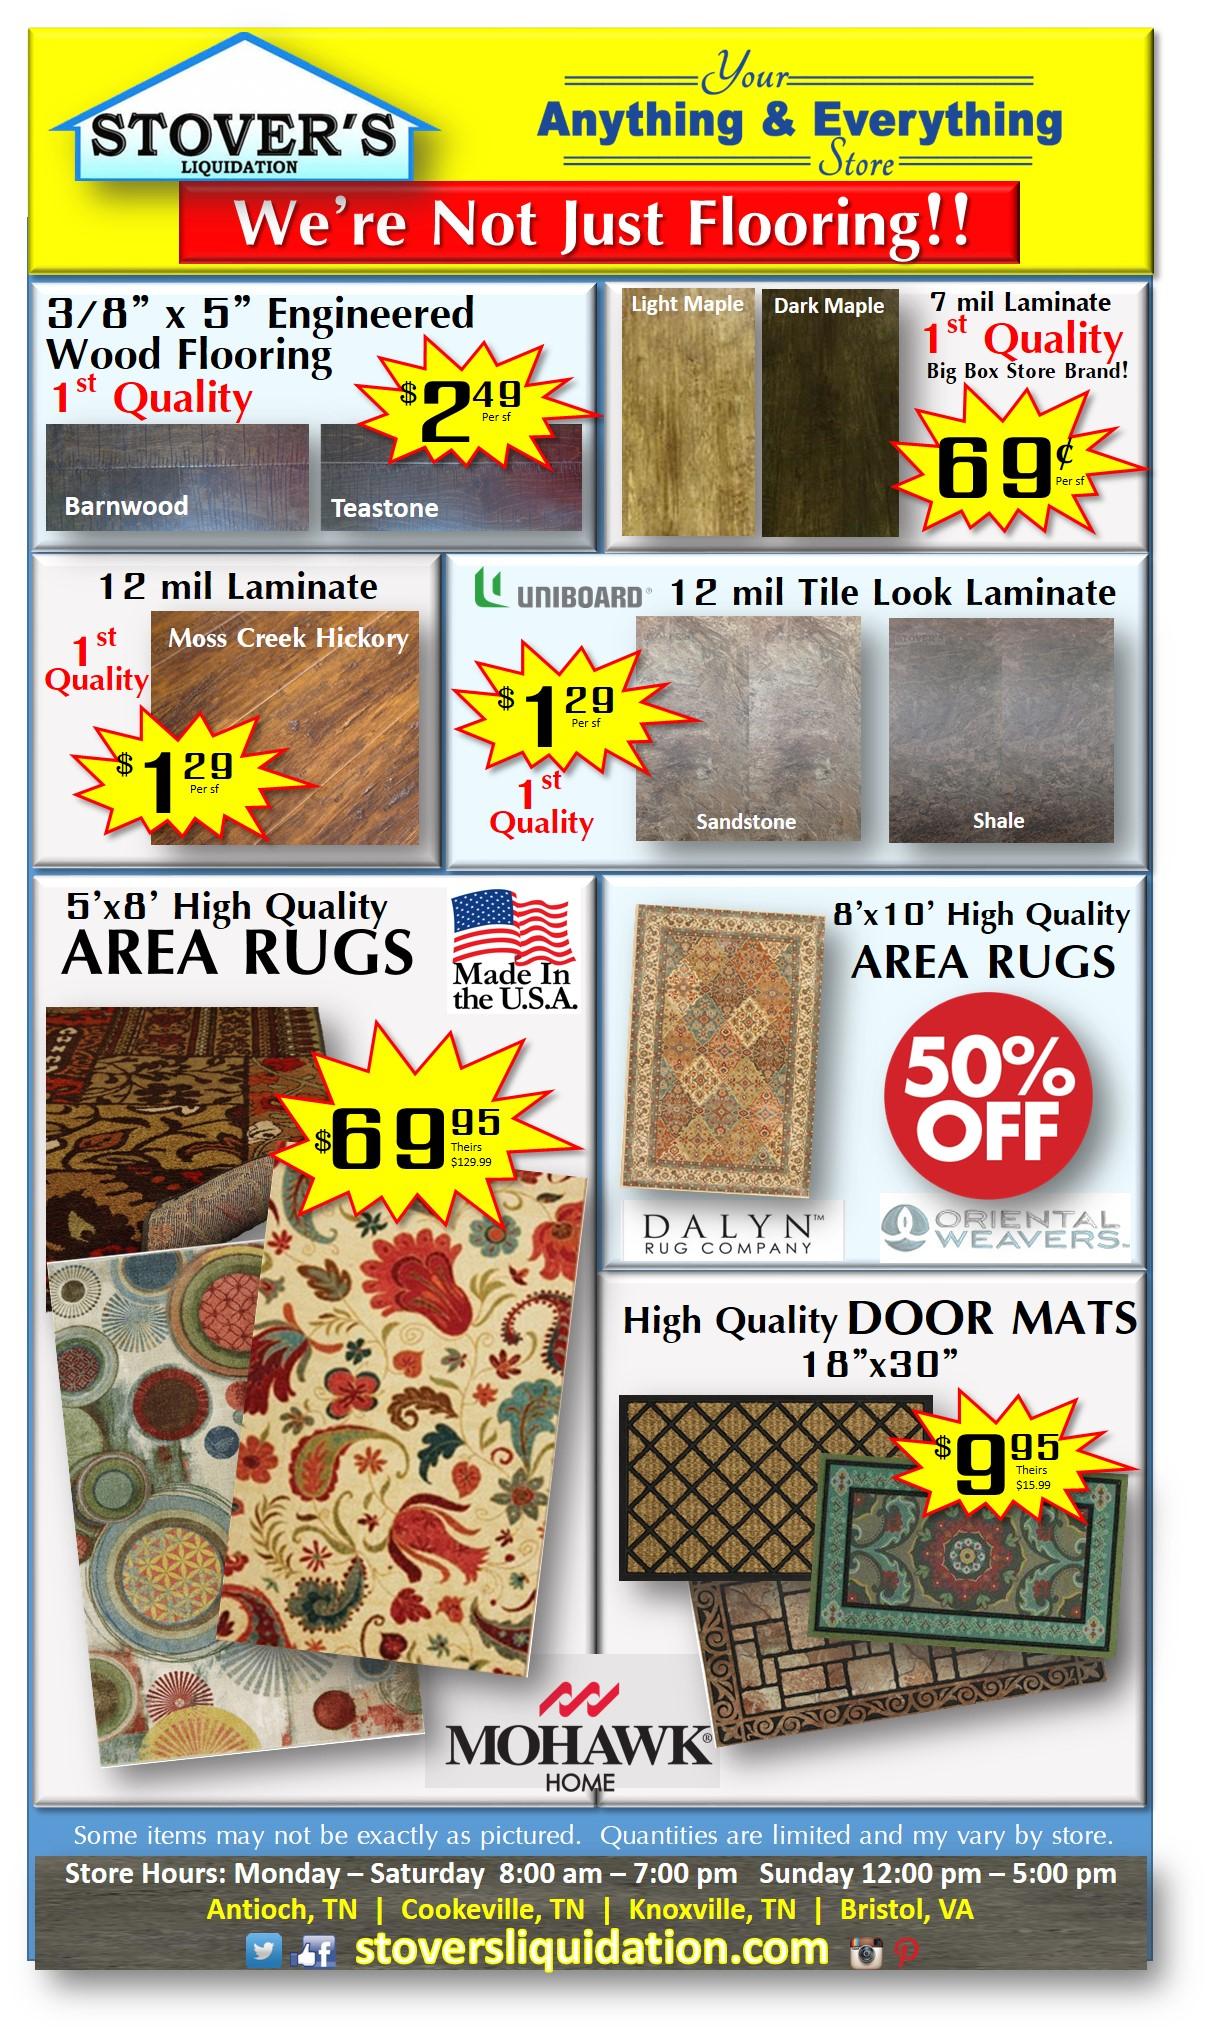 sales-ad-page-4.jpg